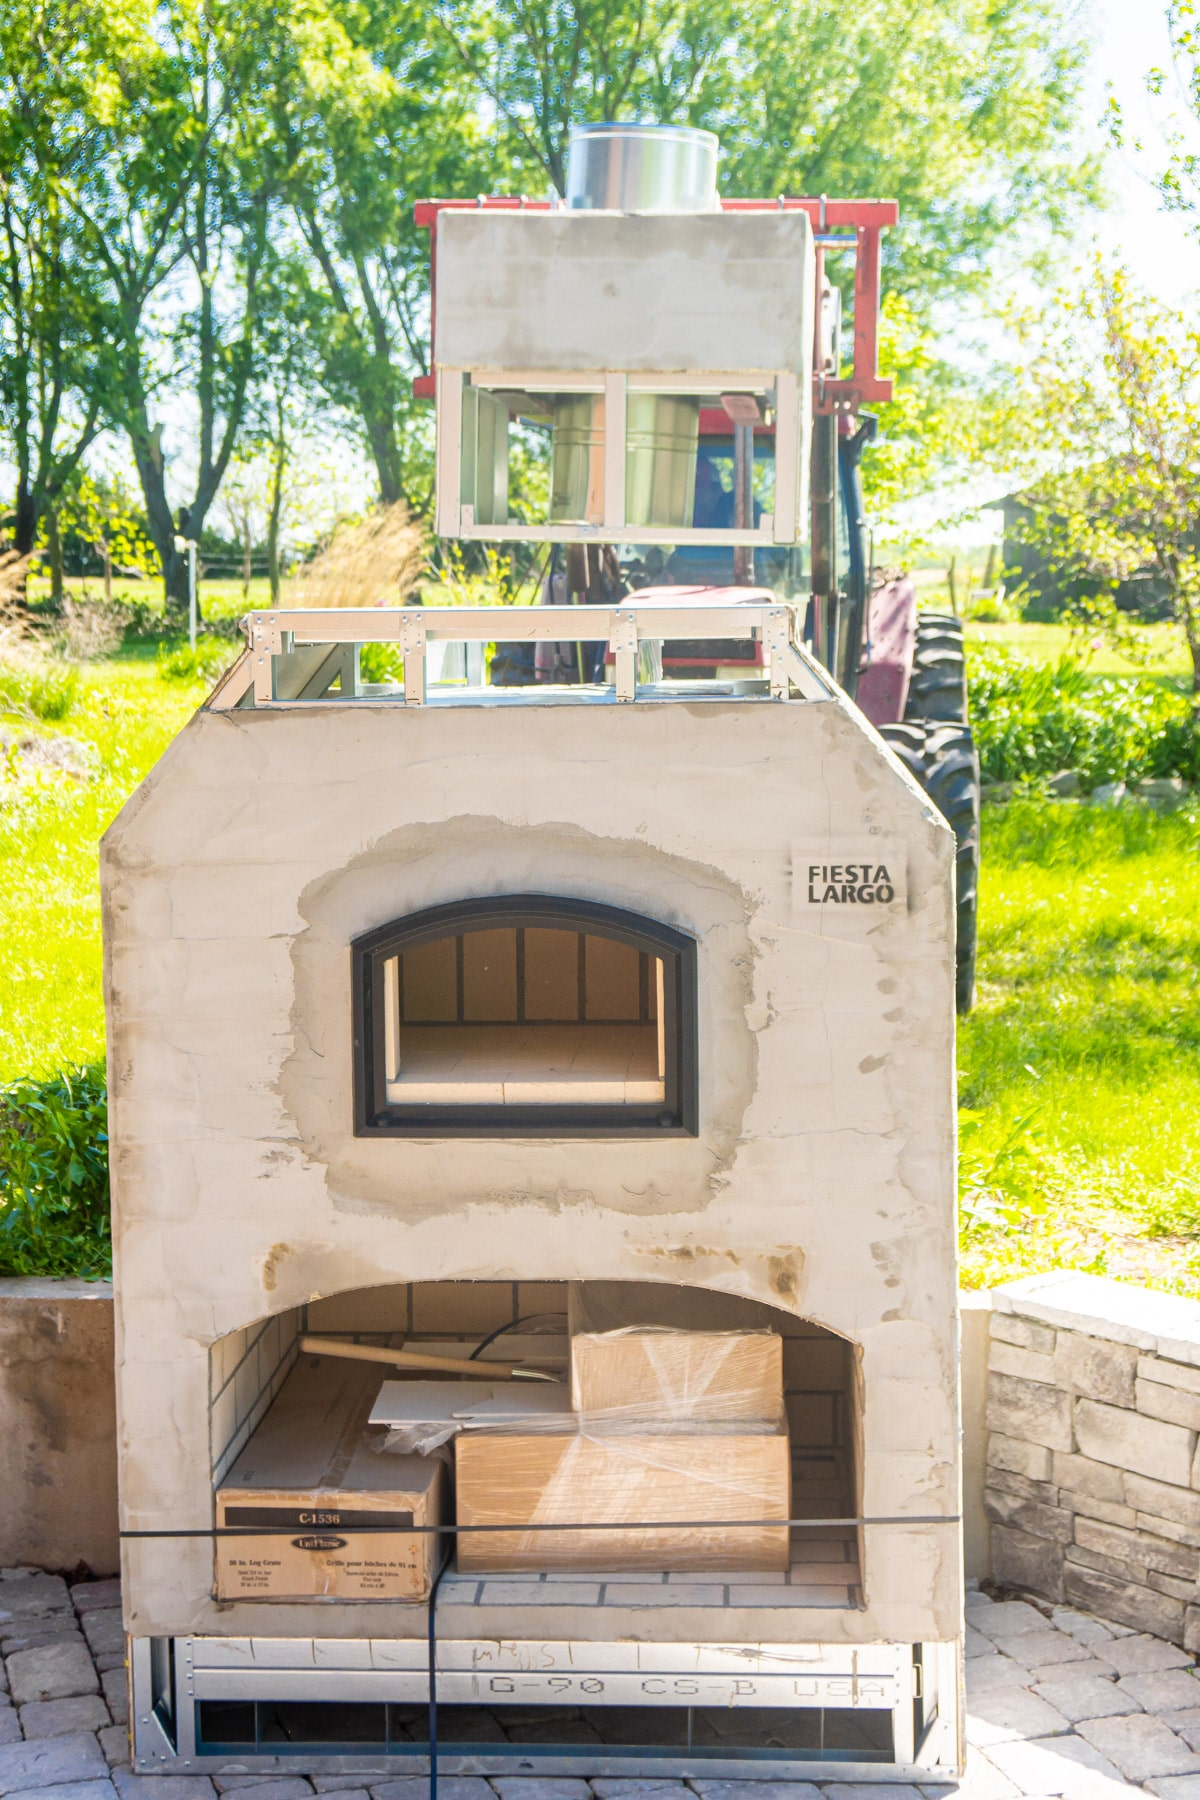 Forklift placing chimney on top of backyard brick oven